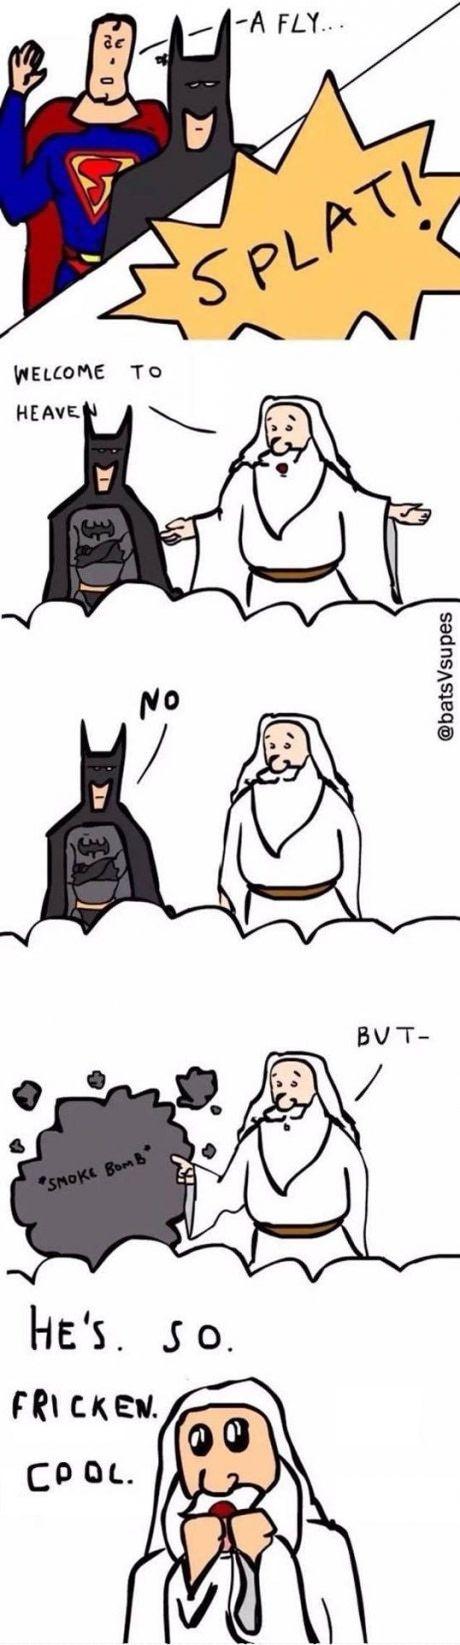 Not a Batman fan but this is hilarious.